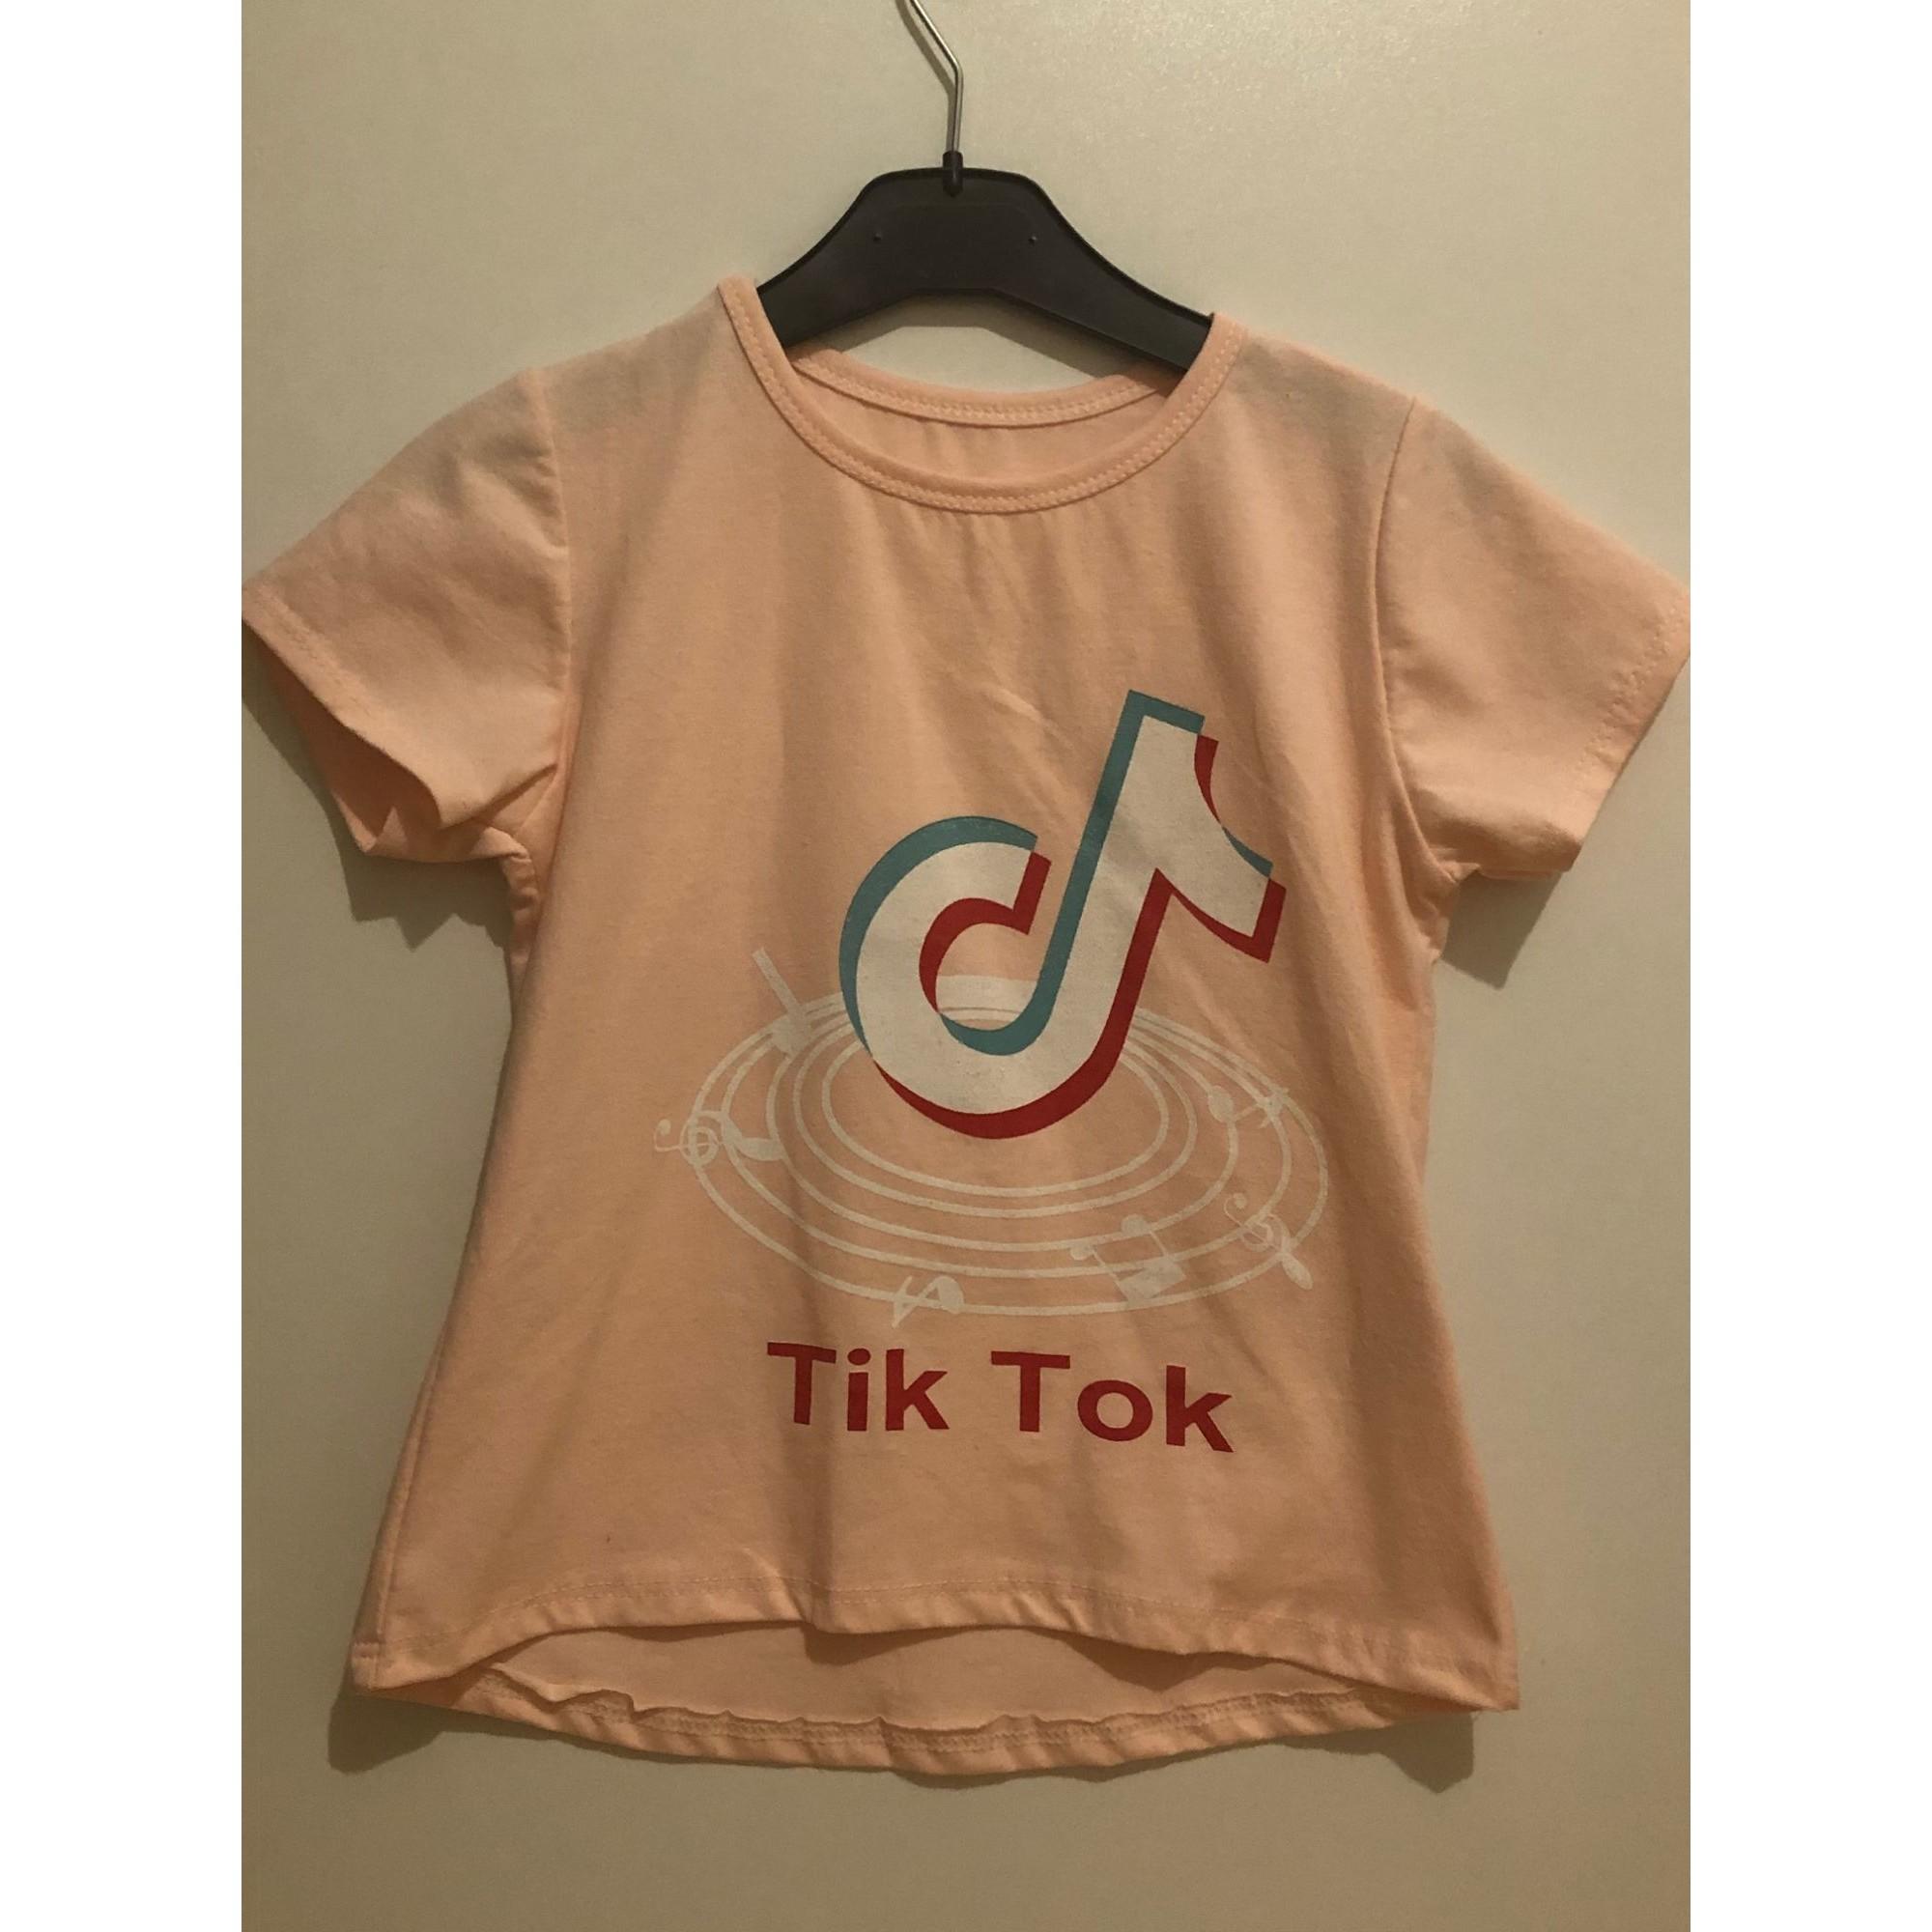 Top, Tee-shirt TIKTOK Rose, fuschia, vieux rose